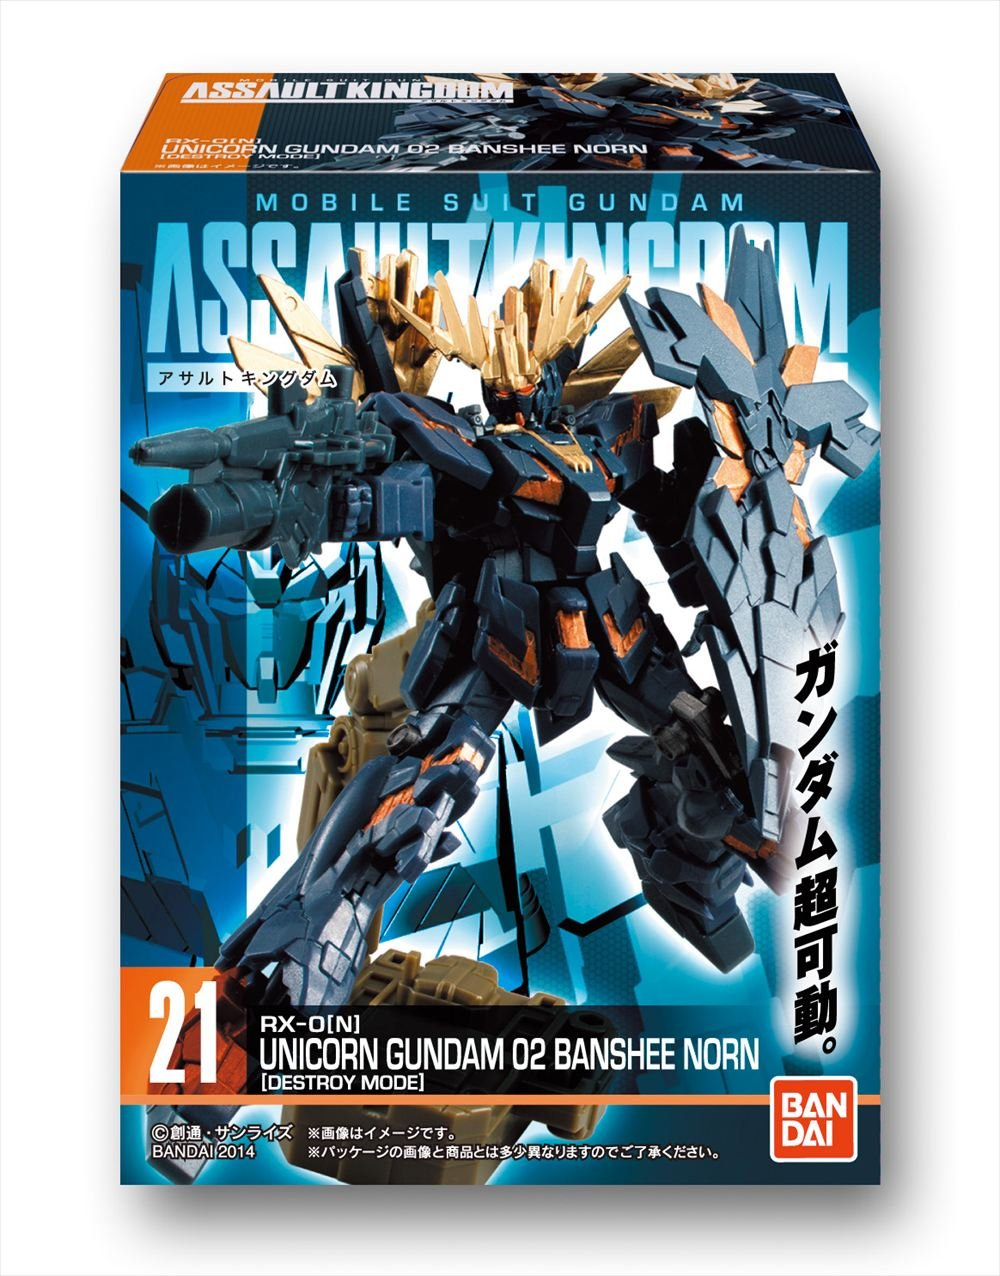 Bandai Shokugan Gundam Assault Kingdom Volume 6 Action Figure Bluefin Distribution Toys BAN91112